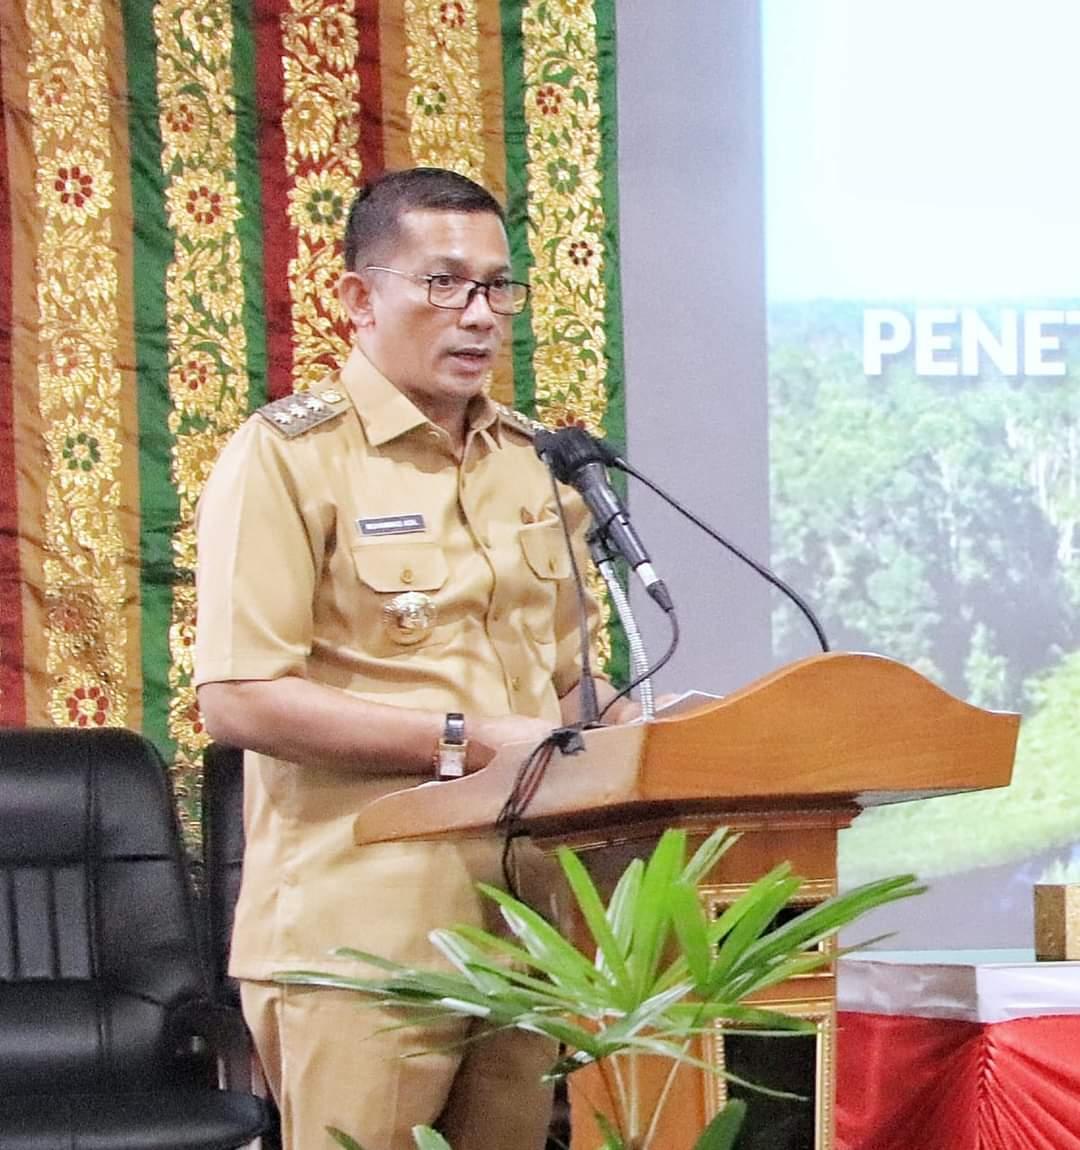 Bupati Meranti Kecewa Terhadap Kinerja Tim Gugus Tugas Provinsi Riau Terkait Kosongnya Stock Vaksin